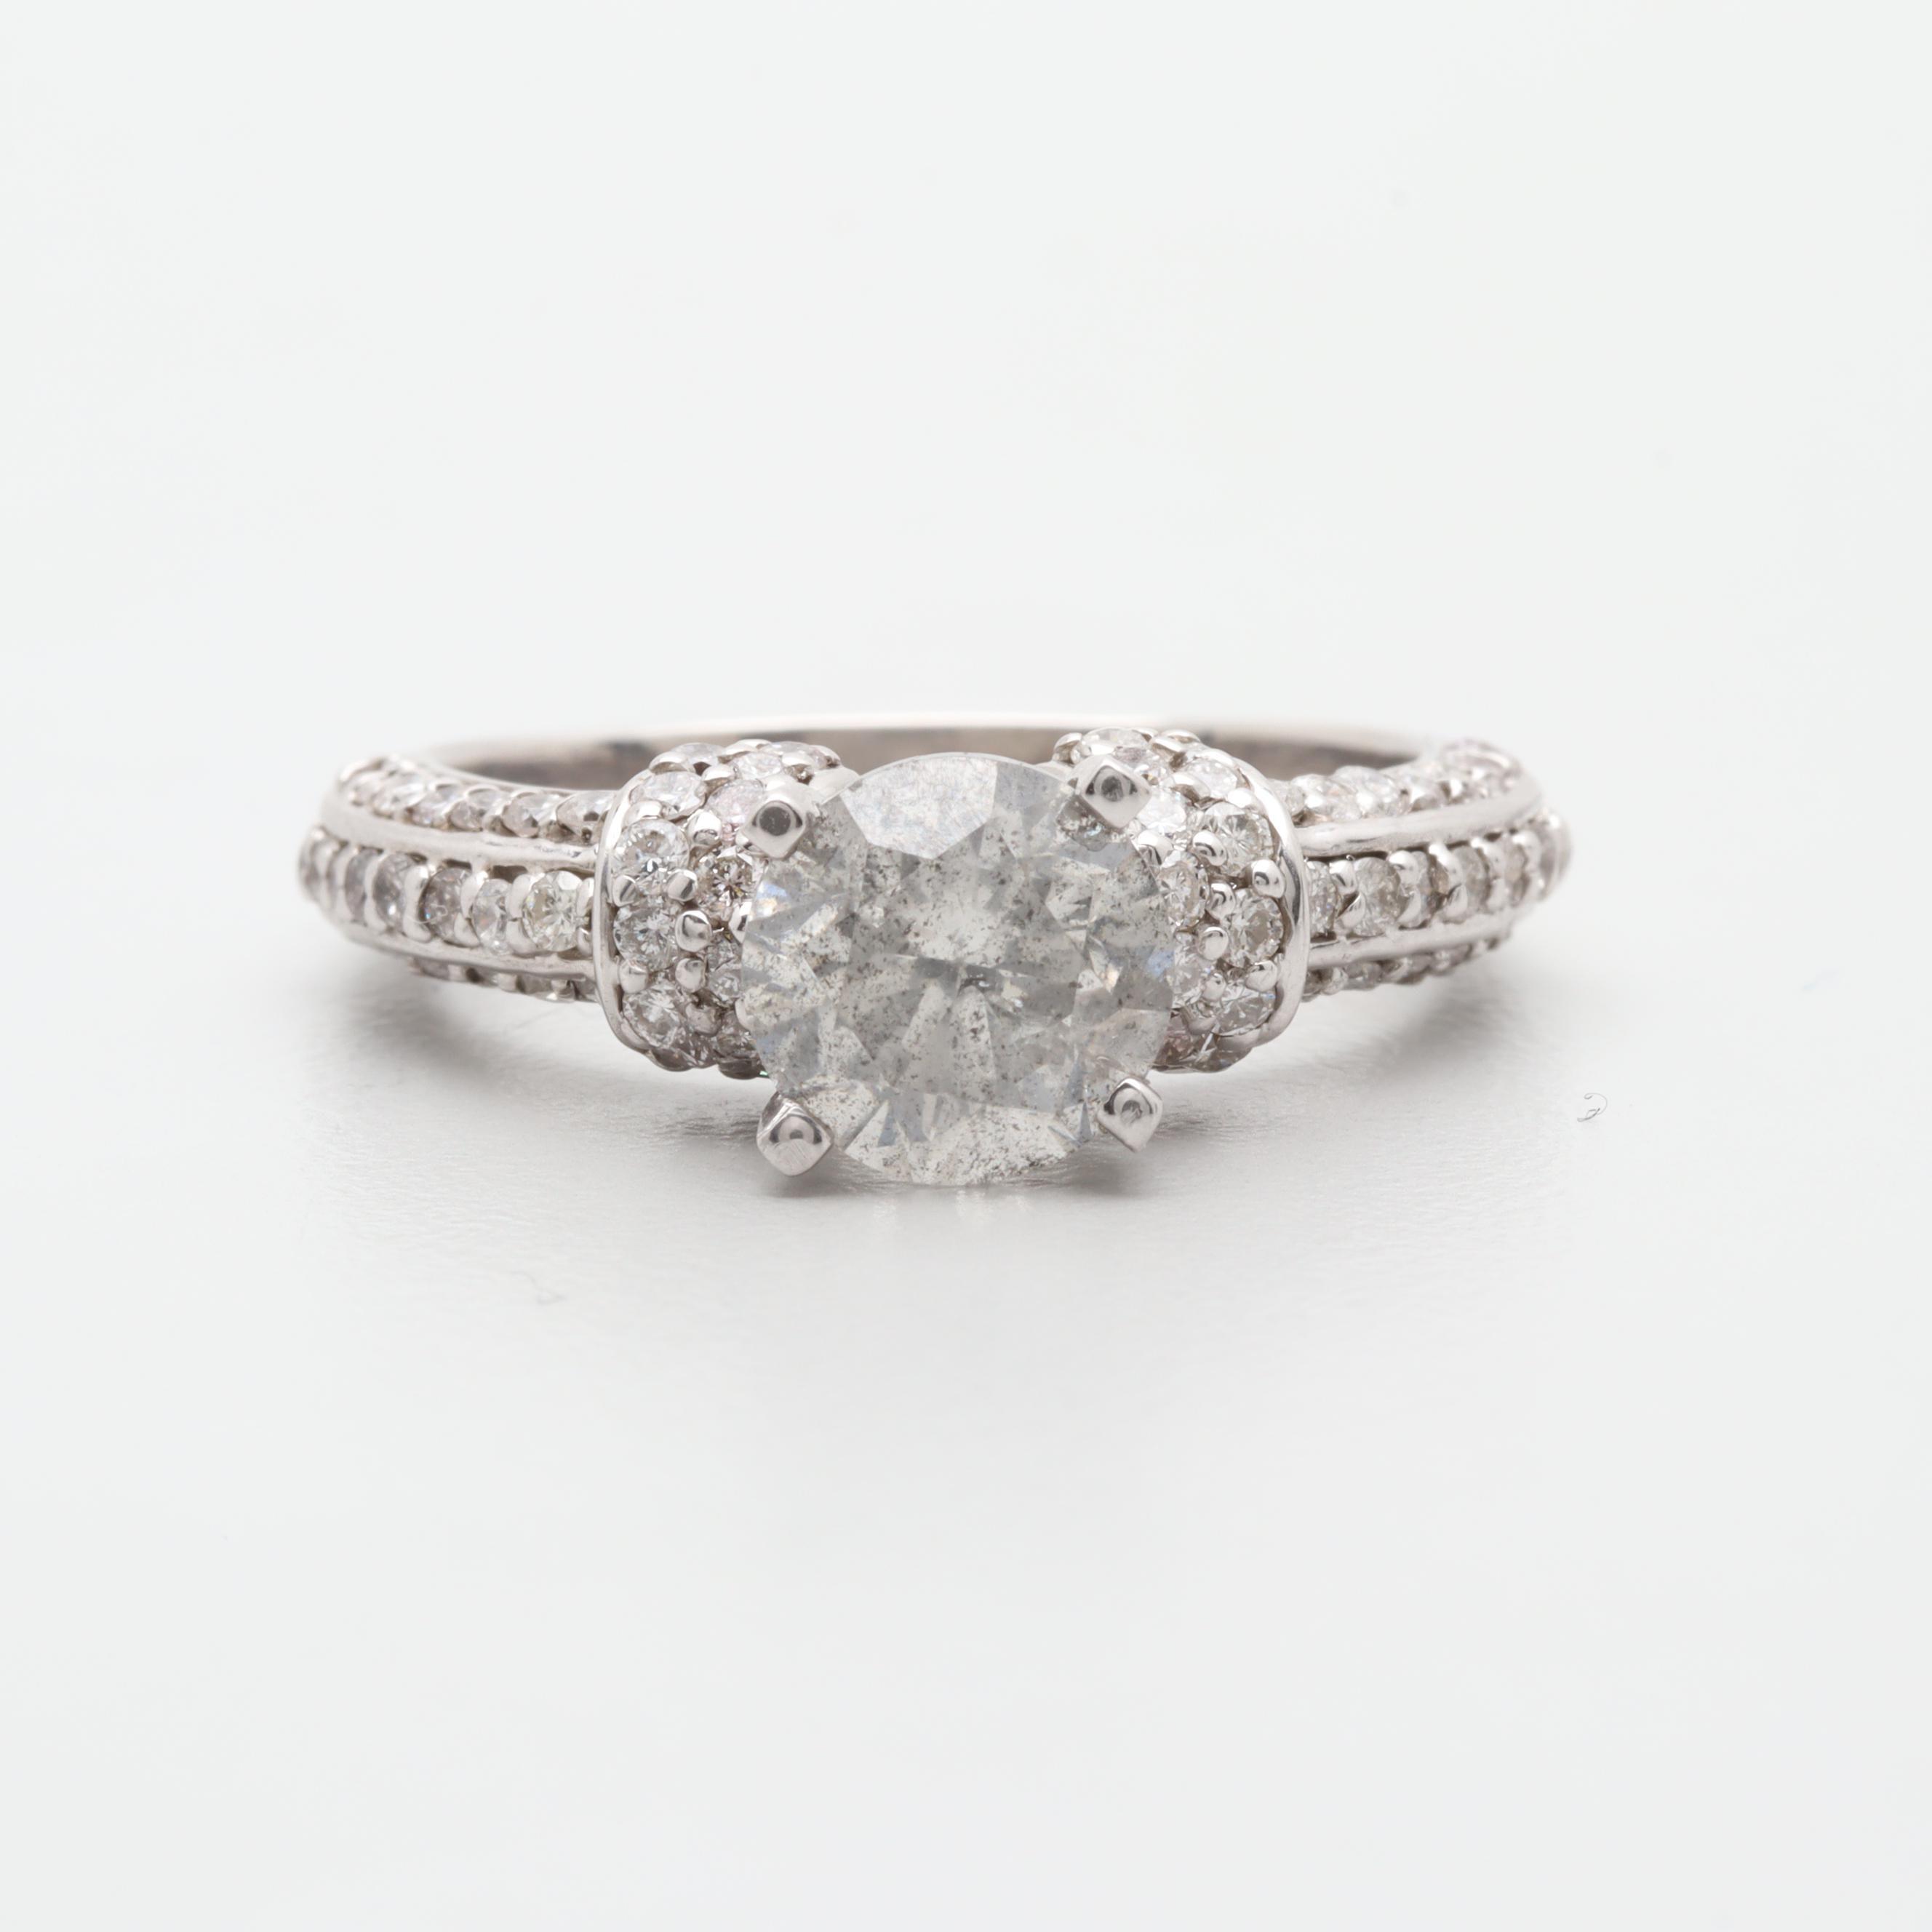 10K and 14K White Gold 2.38 CTW Diamond Ring